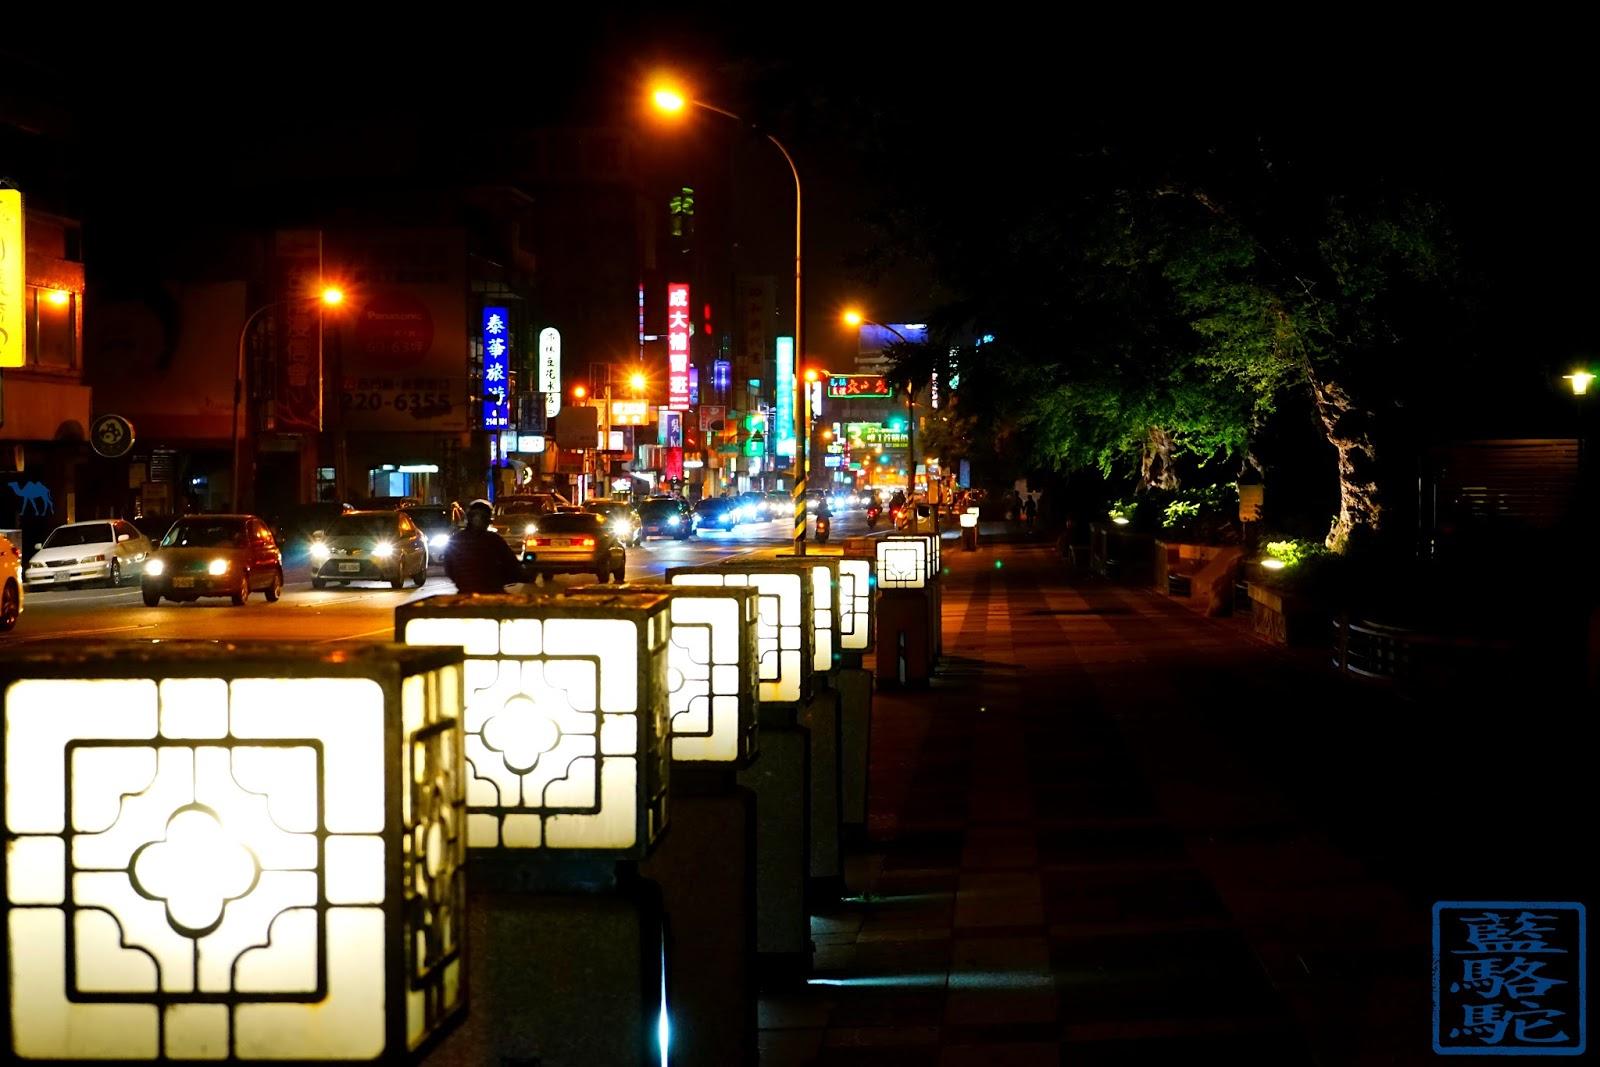 Le Chameau Bleu - Rue de Taitung Taiwan - Voyage à Taiwan